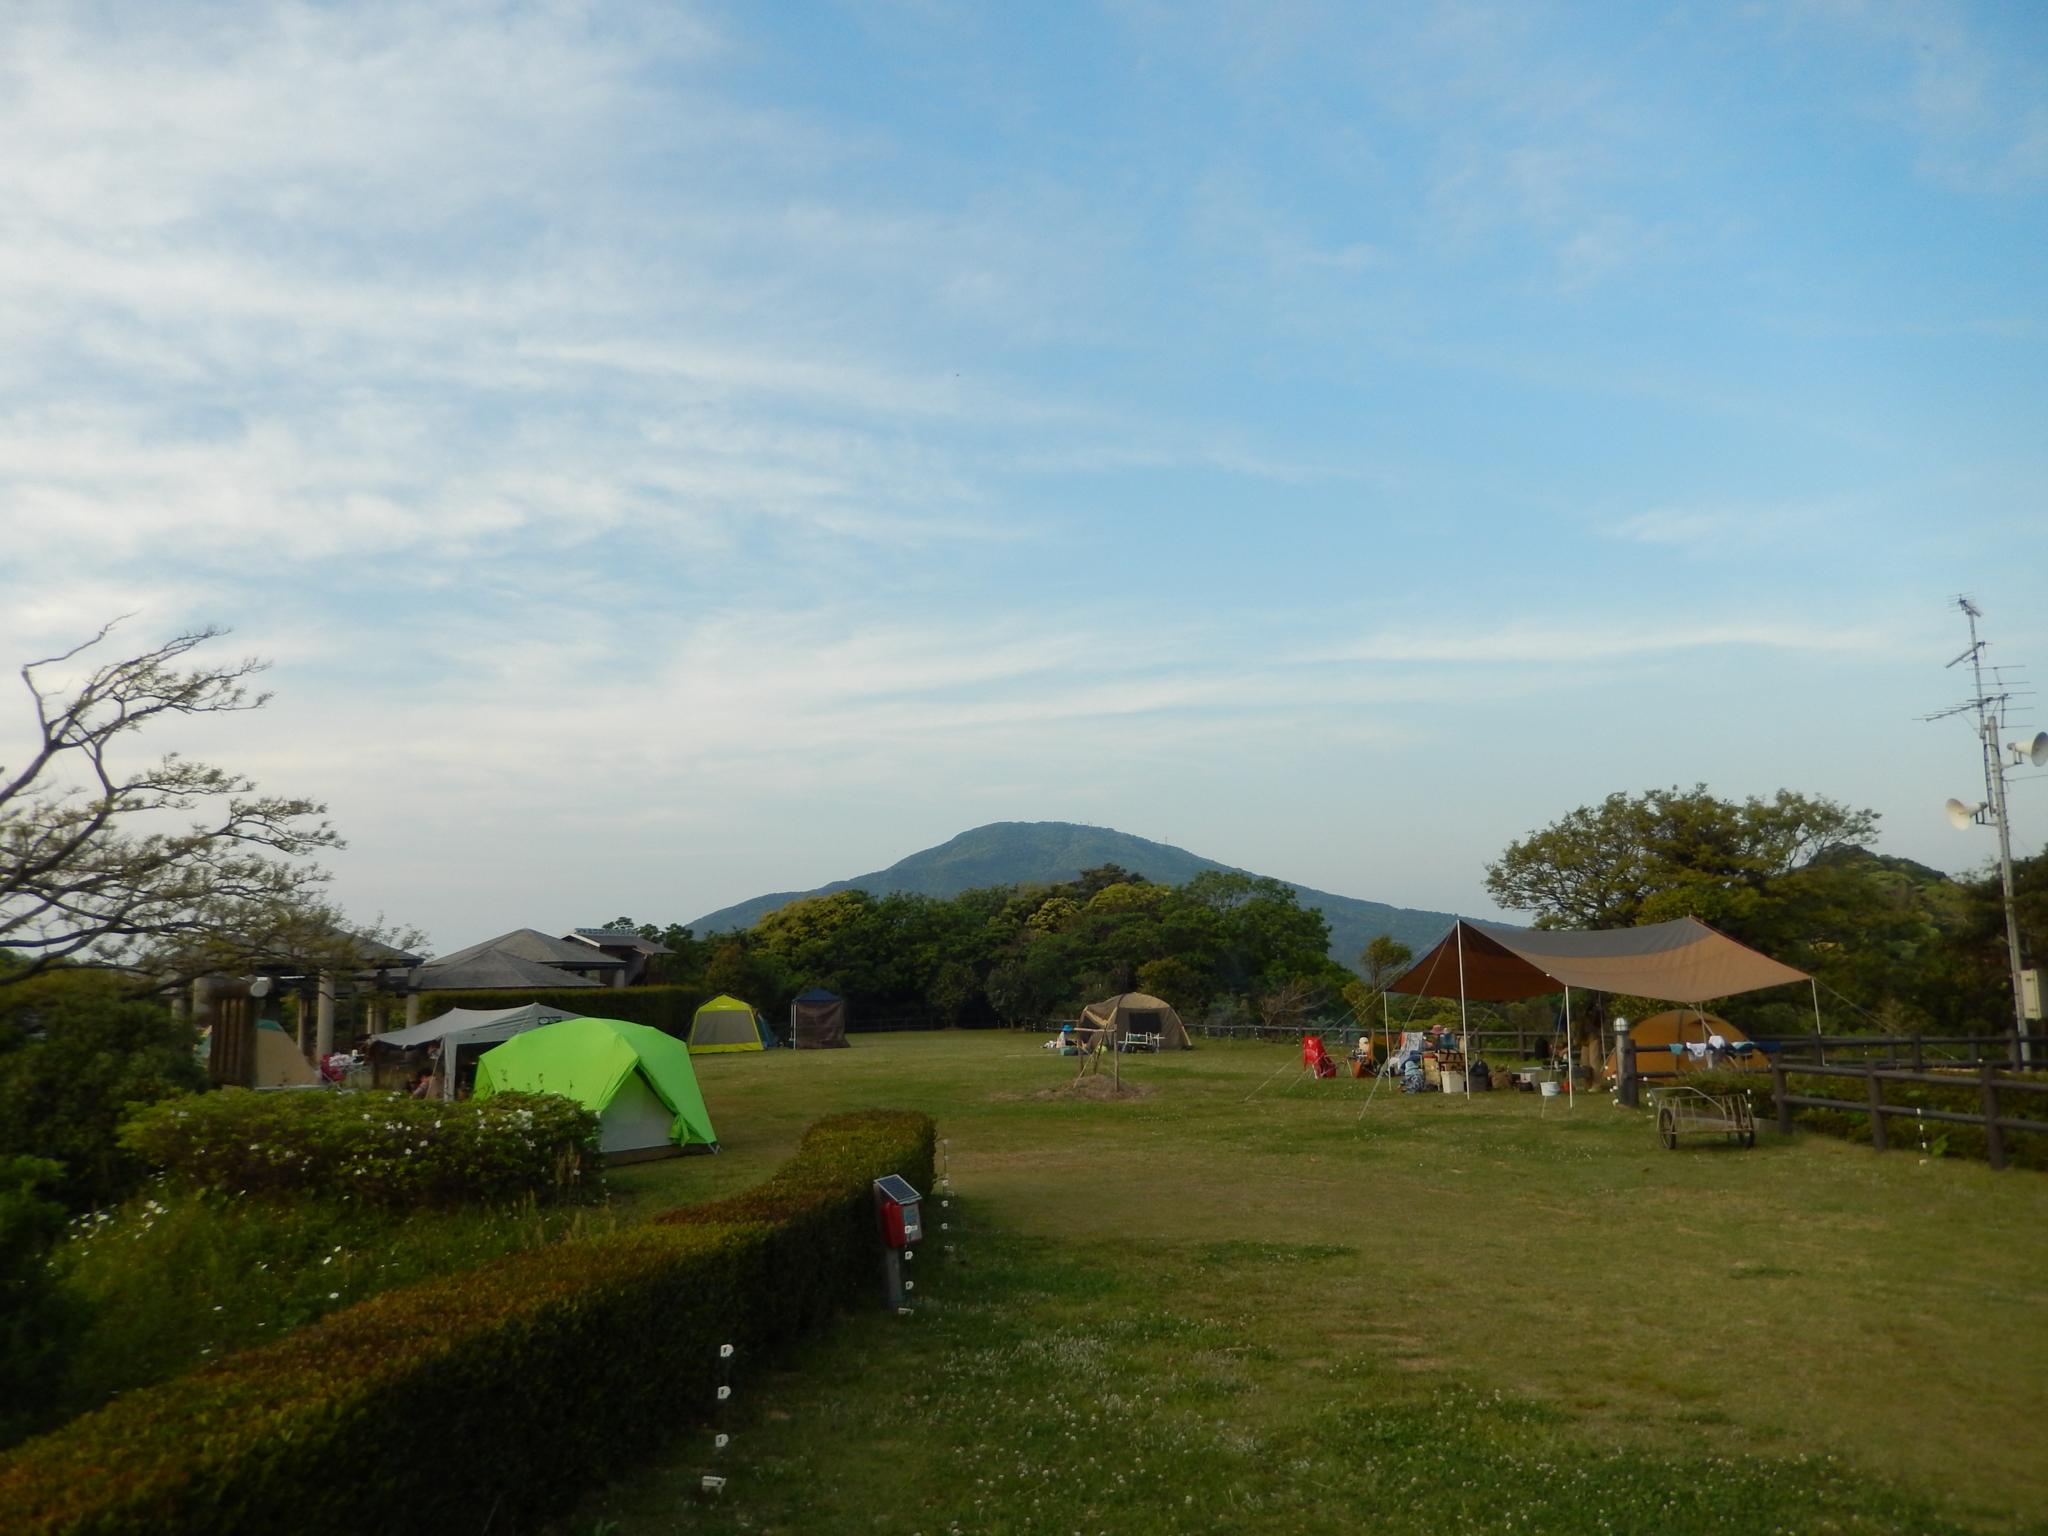 f:id:ToshUeno:20150502181818j:plain